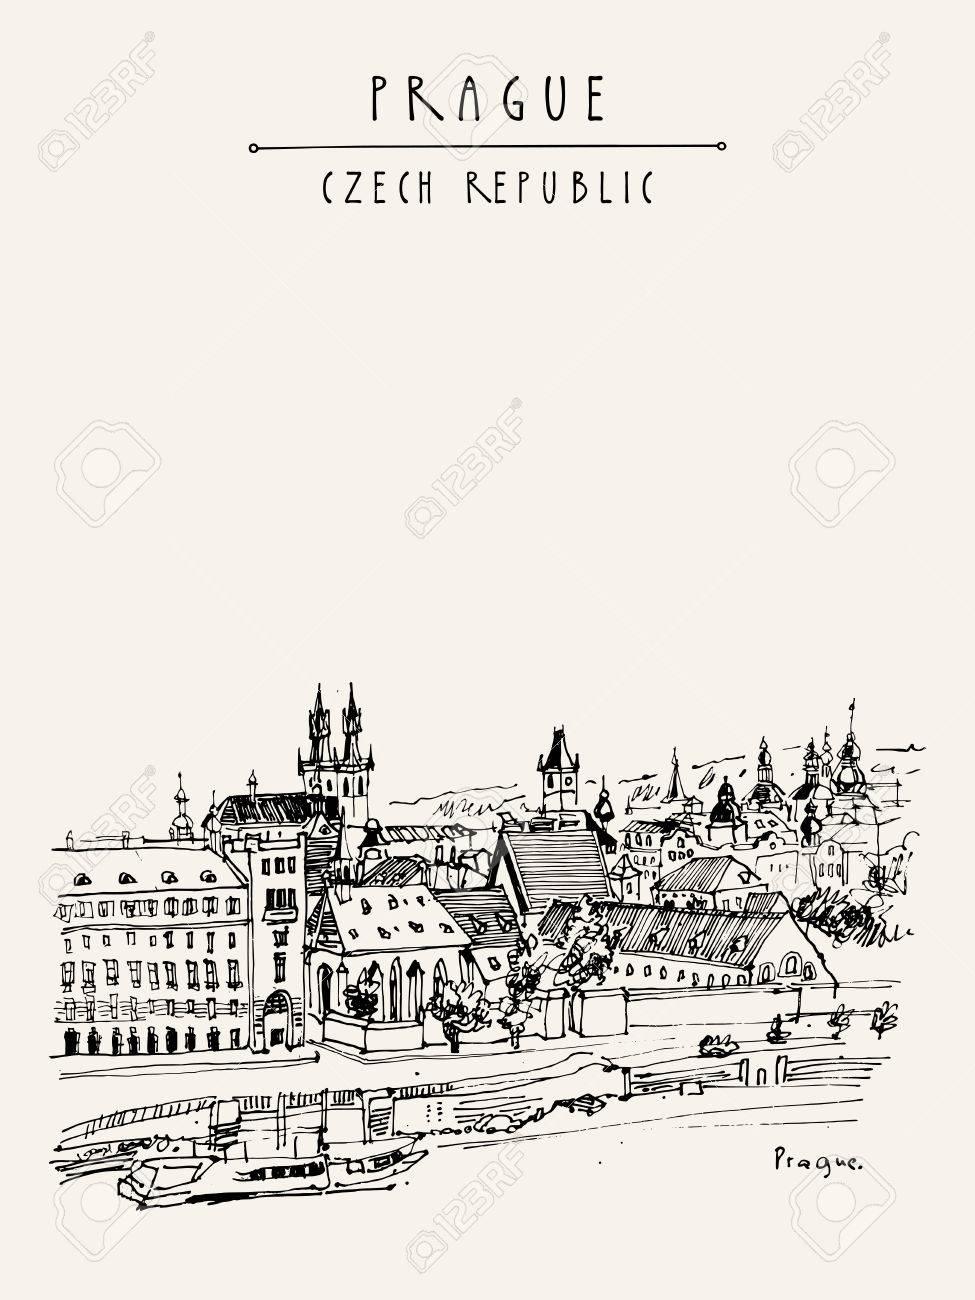 Prague skyline, Czech Republic, Europe. European cityscape. Travel sketch. Hand-drawn vintage touristic postcard, poster, book or calendar illustration in vector - 63467922